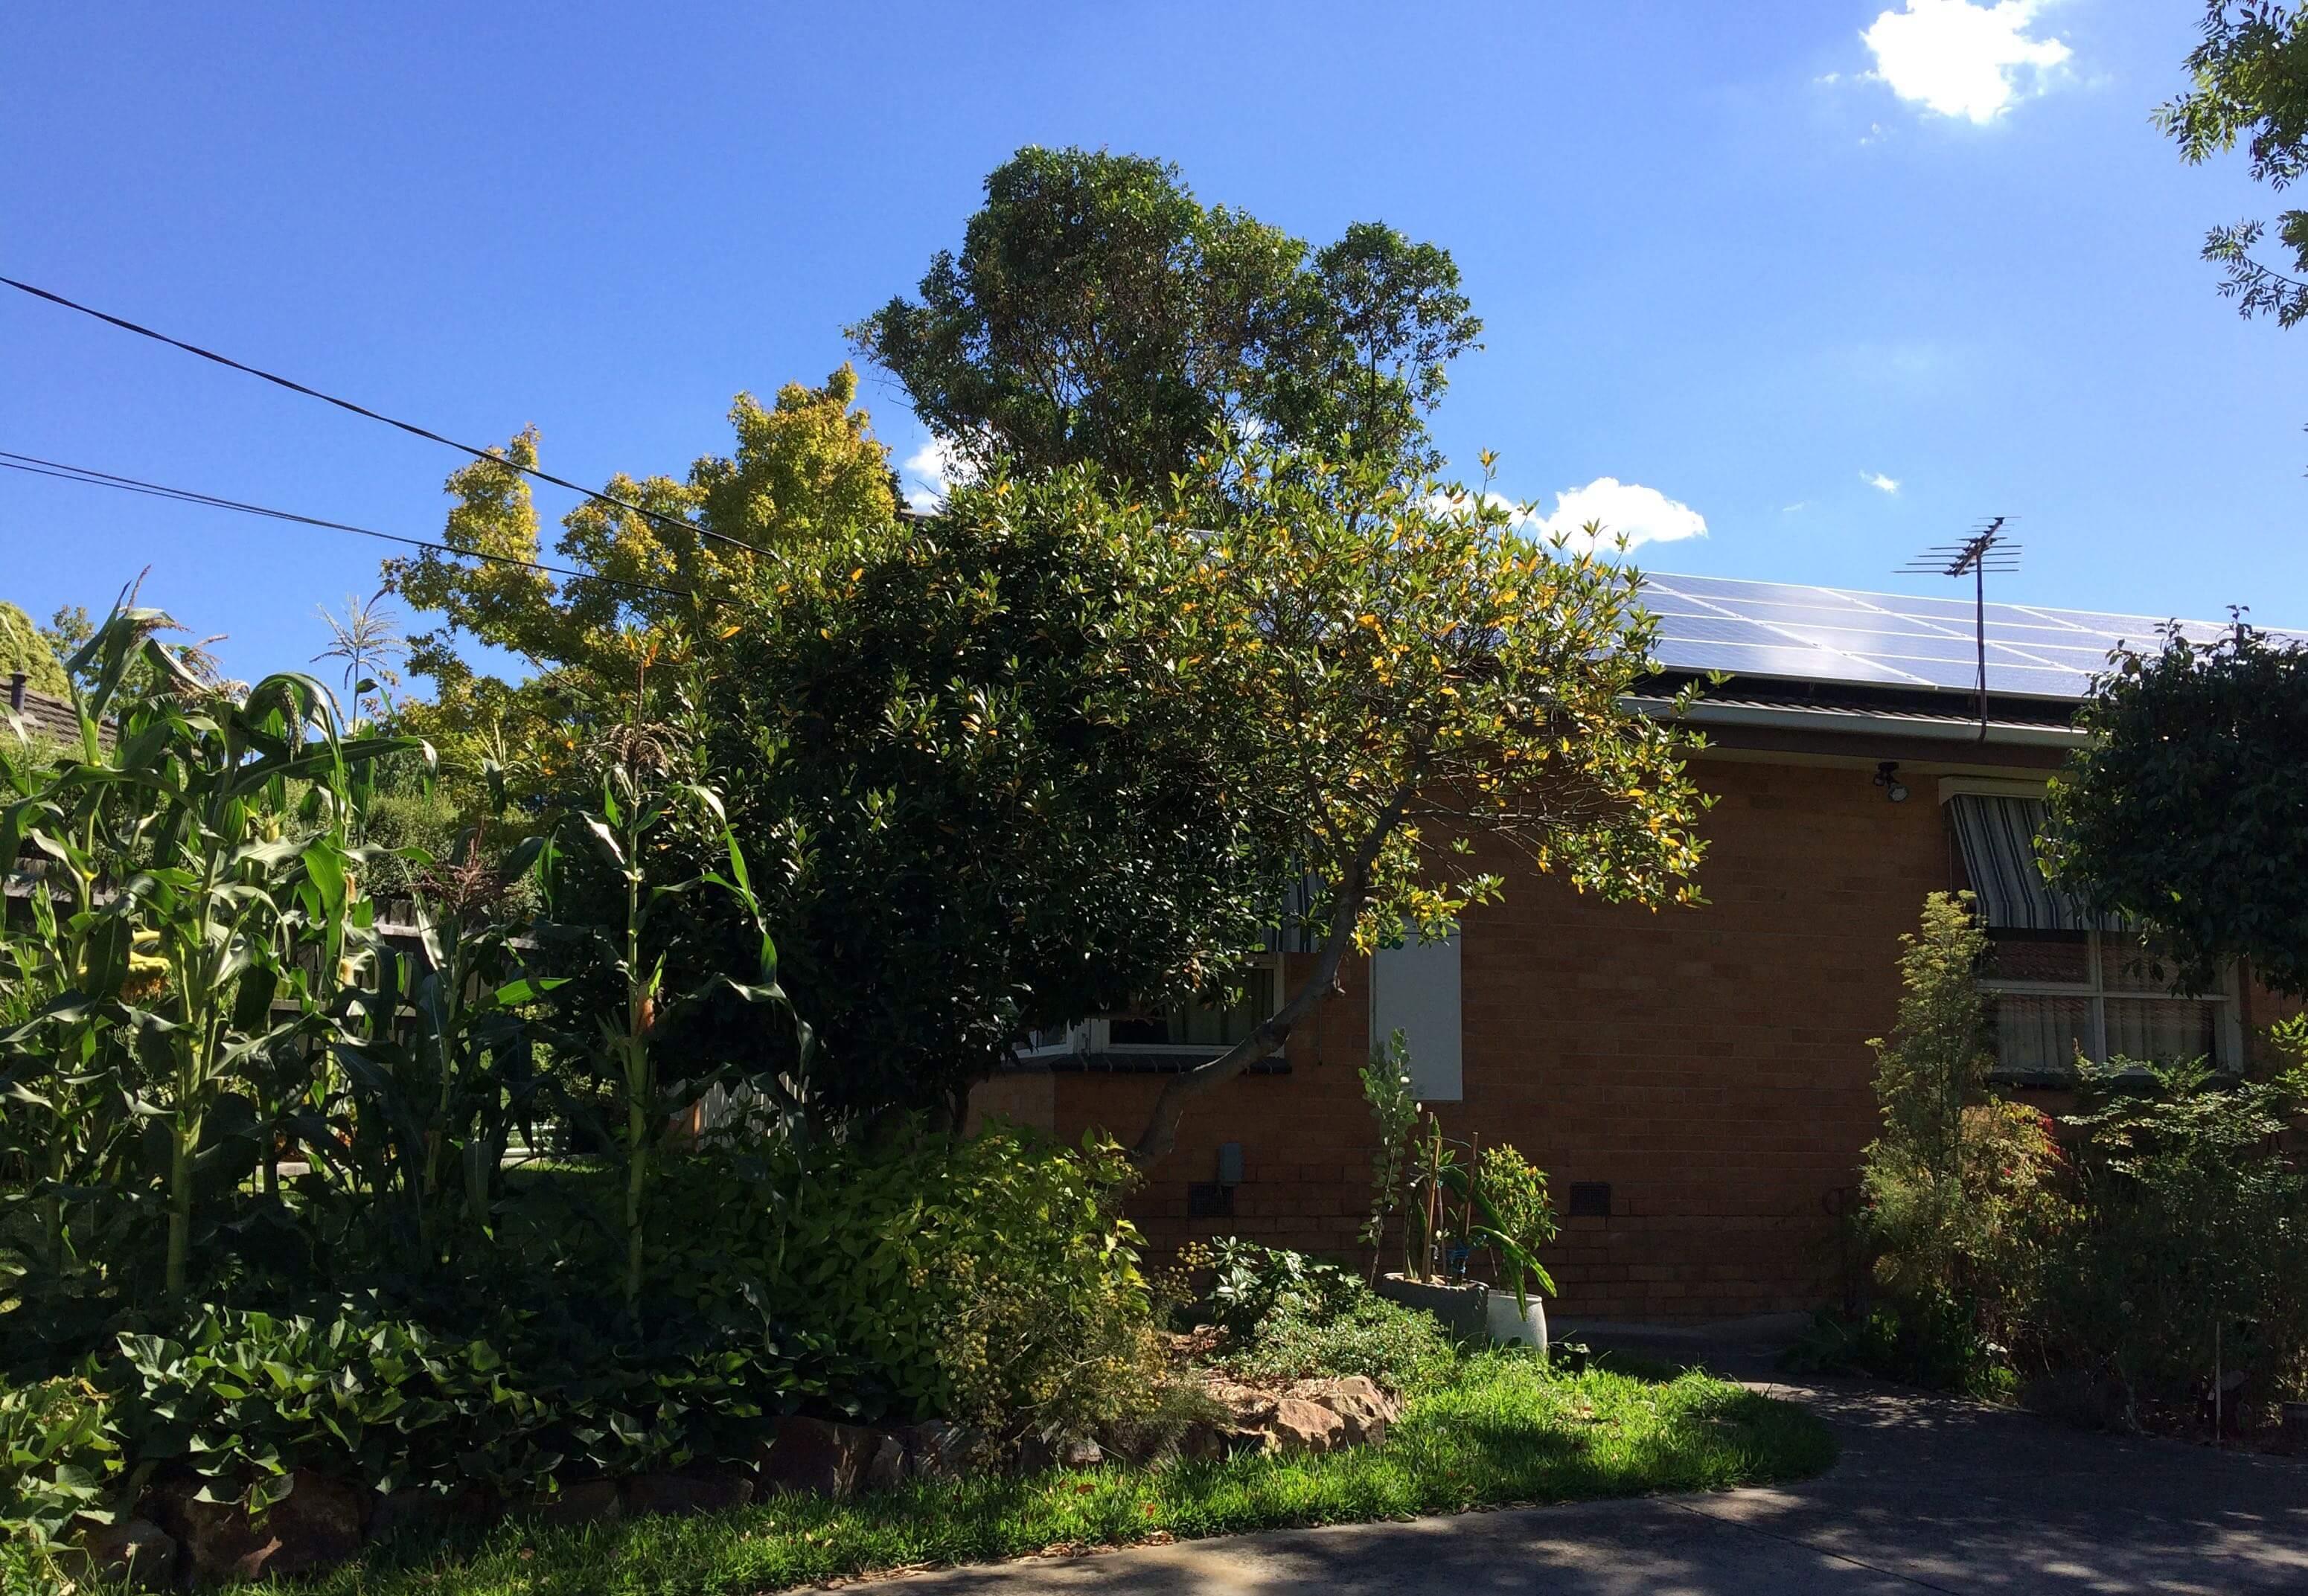 1960s Retrofitted Home Improvement – Burwood